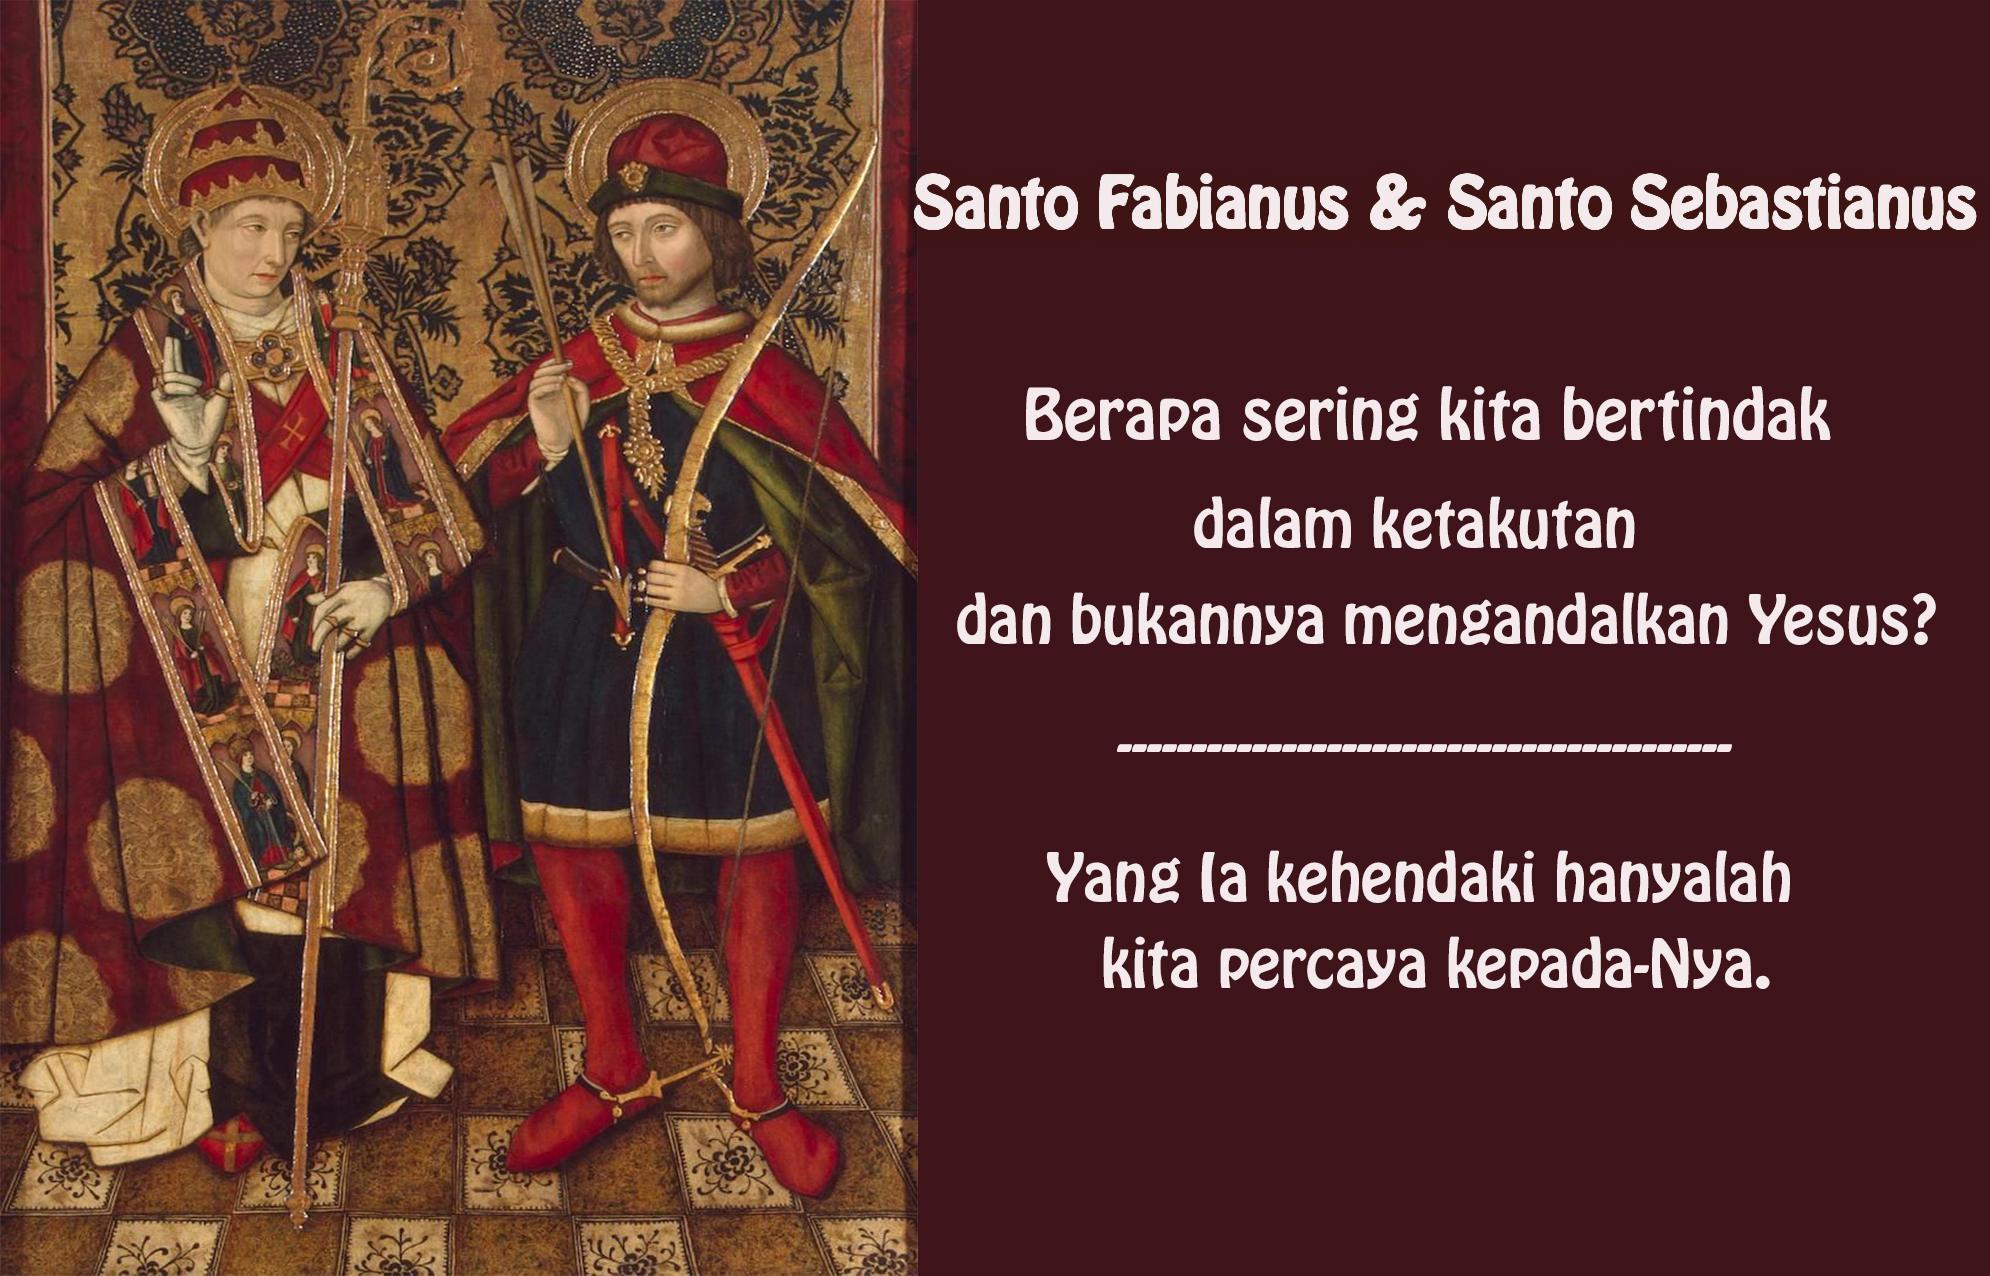 20 Januari, Santa Martha dari Persia, Santo Fabianus & Santo Sebastianus, katekese, katolik, Komsos KWI, Konferensi Waligereja Indonesia, KWI, Para Kudus di Surga, putera allah, santo santa, Sukacita, teladan kita